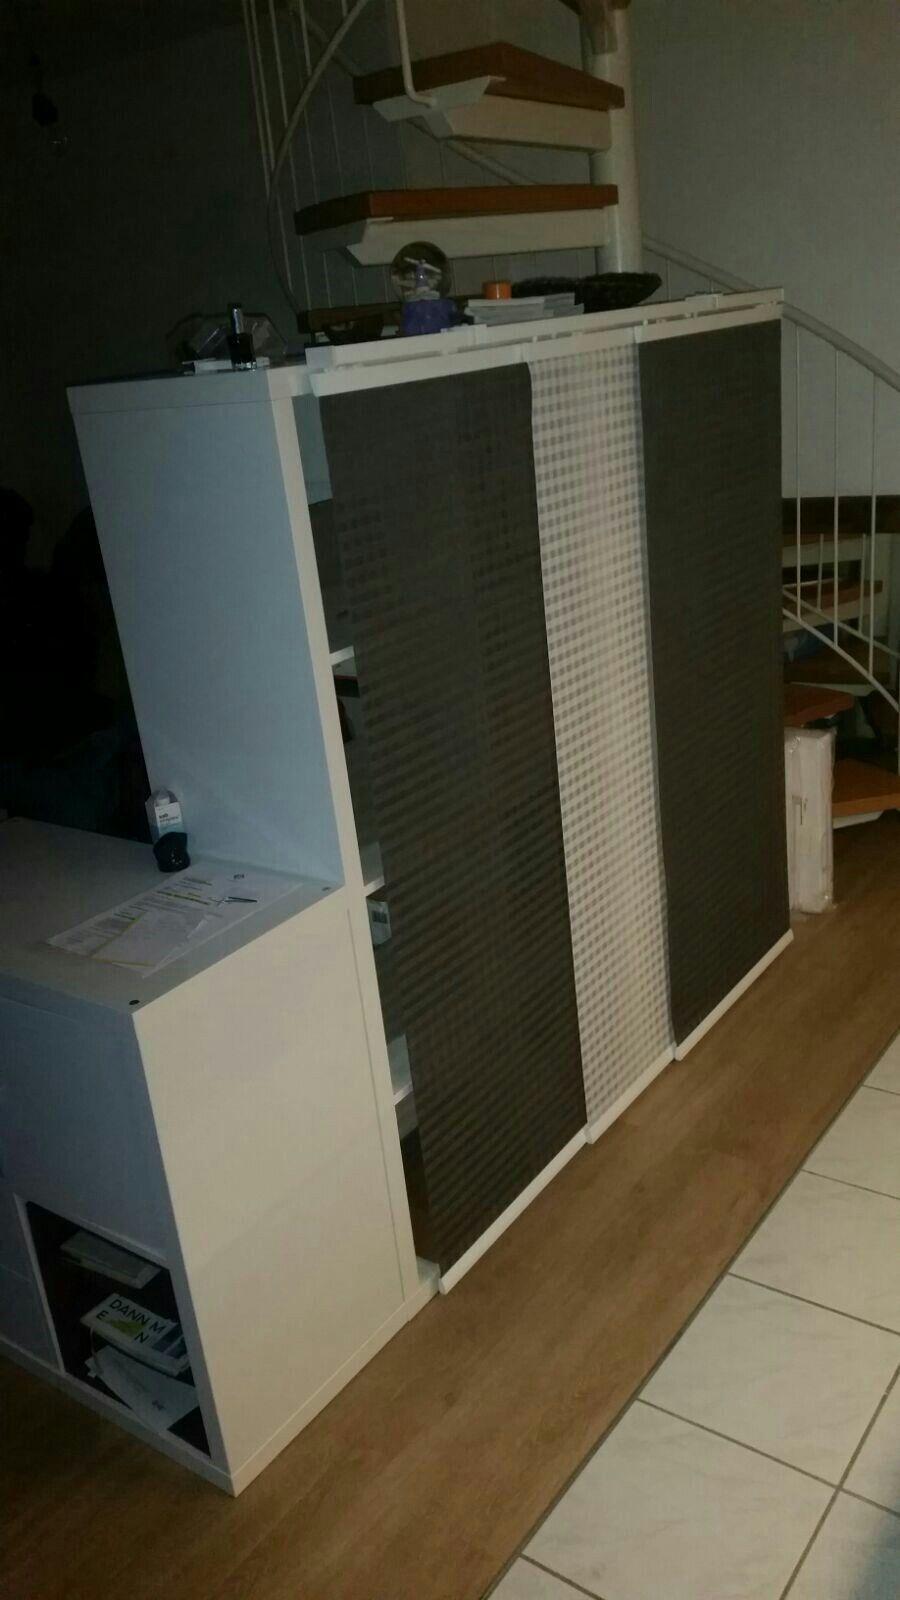 New Pictures Ikea Kallax Hack Room Divider With Sliding Curtain Simply The 3 Rail On The Kalla Ideas Th Schiebegardinen Ikea Raumteiler Ideen Raumteiler